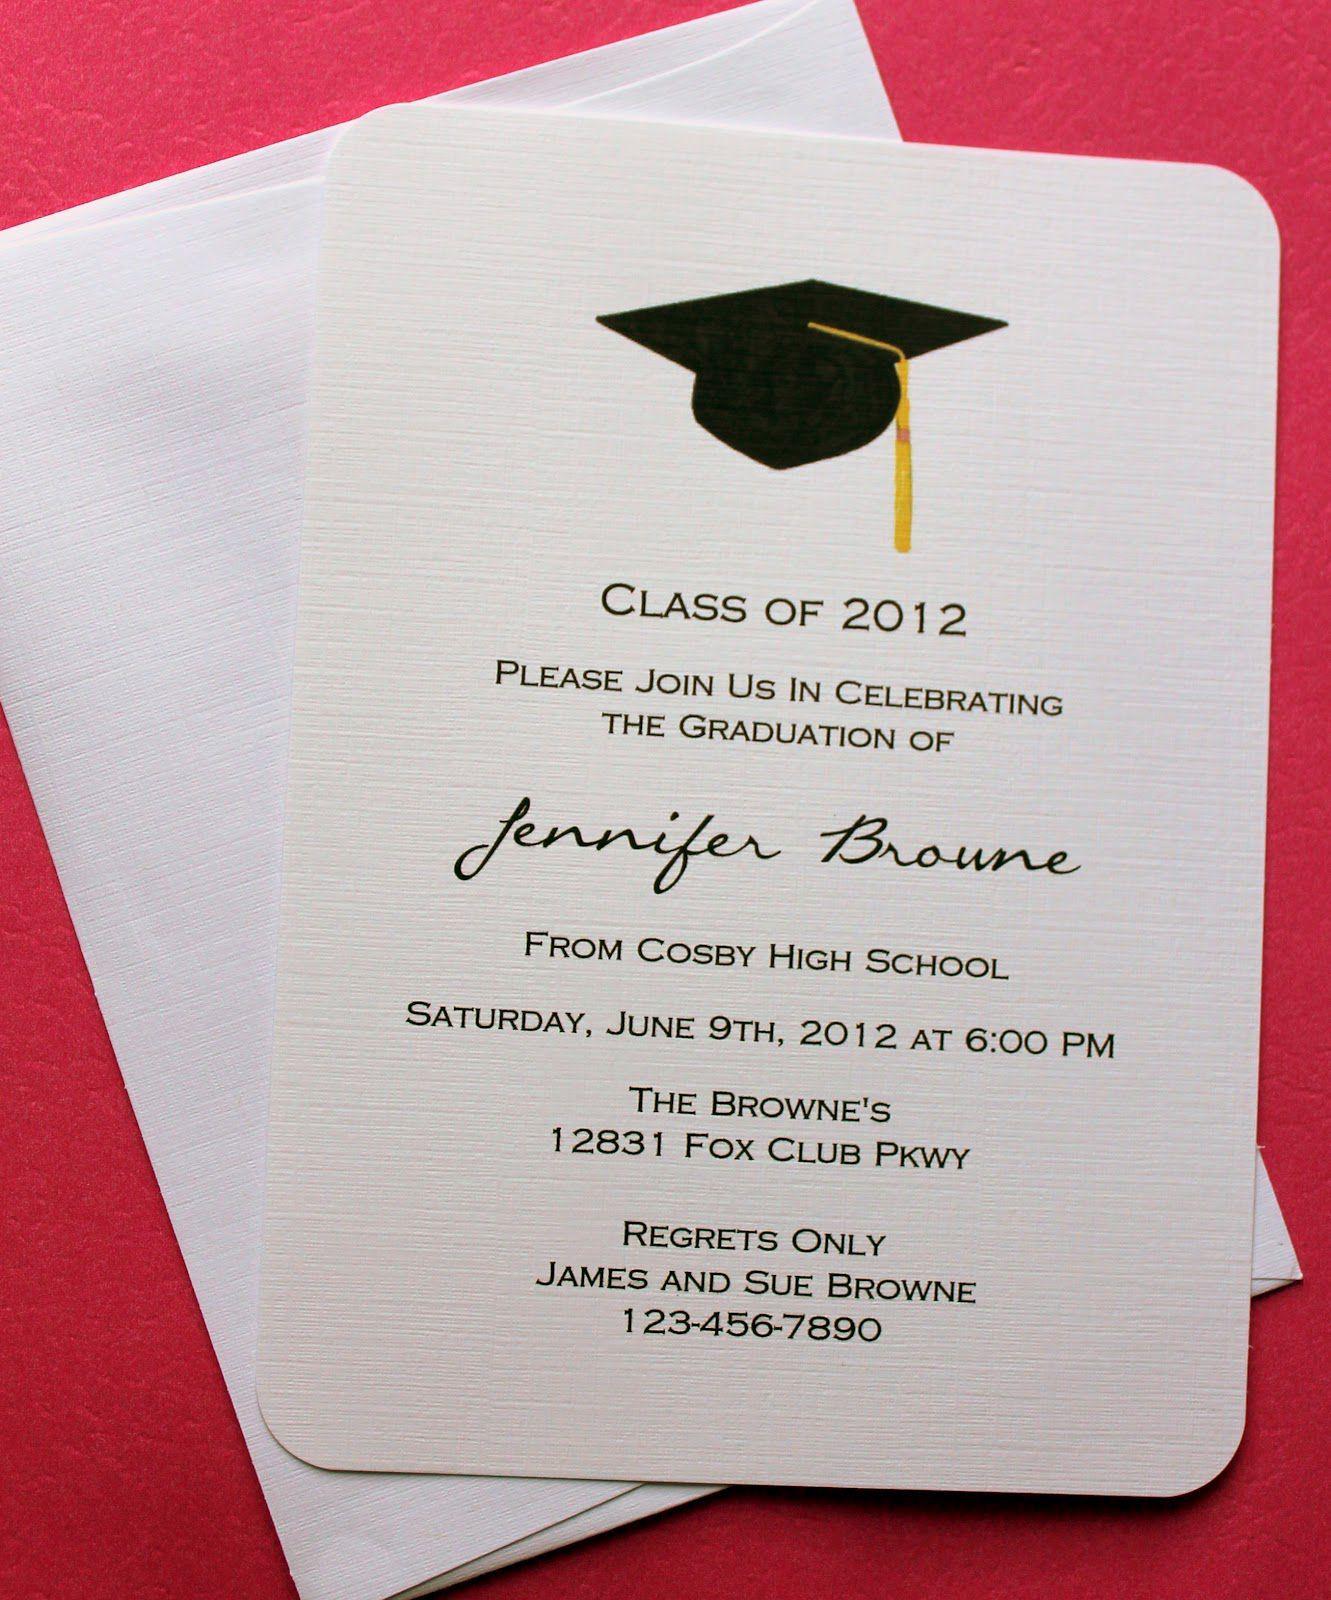 Graduation Invitation Templates Microsoft Word | Graduation With Regard To Graduation Invitation Templates Microsoft Word